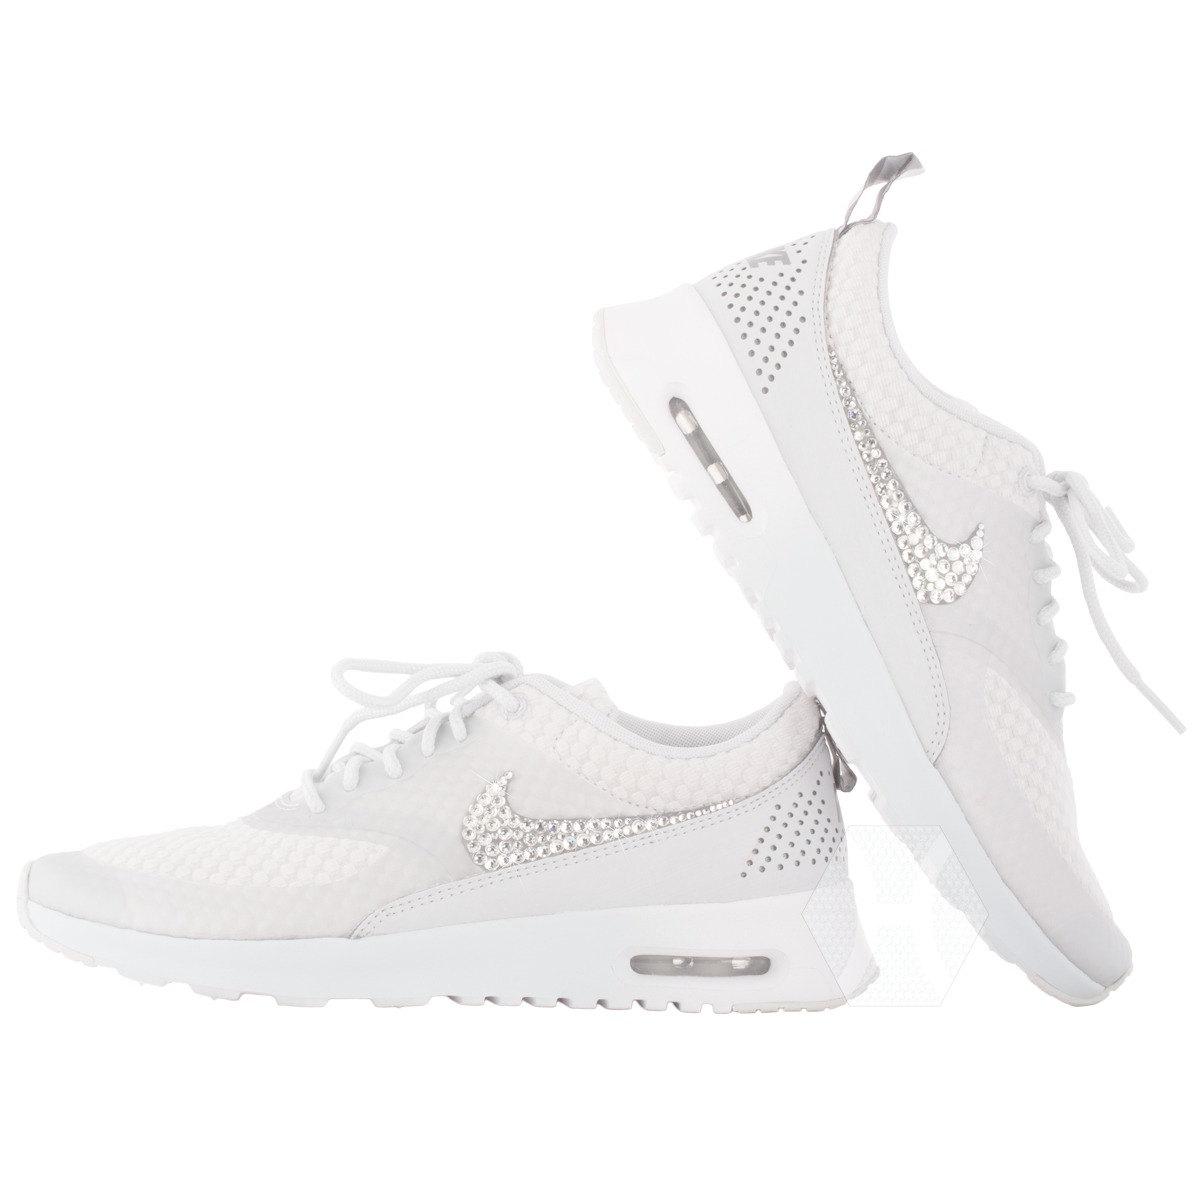 Swarovski Women's Nike Air Max Thea Premium Navy Blue